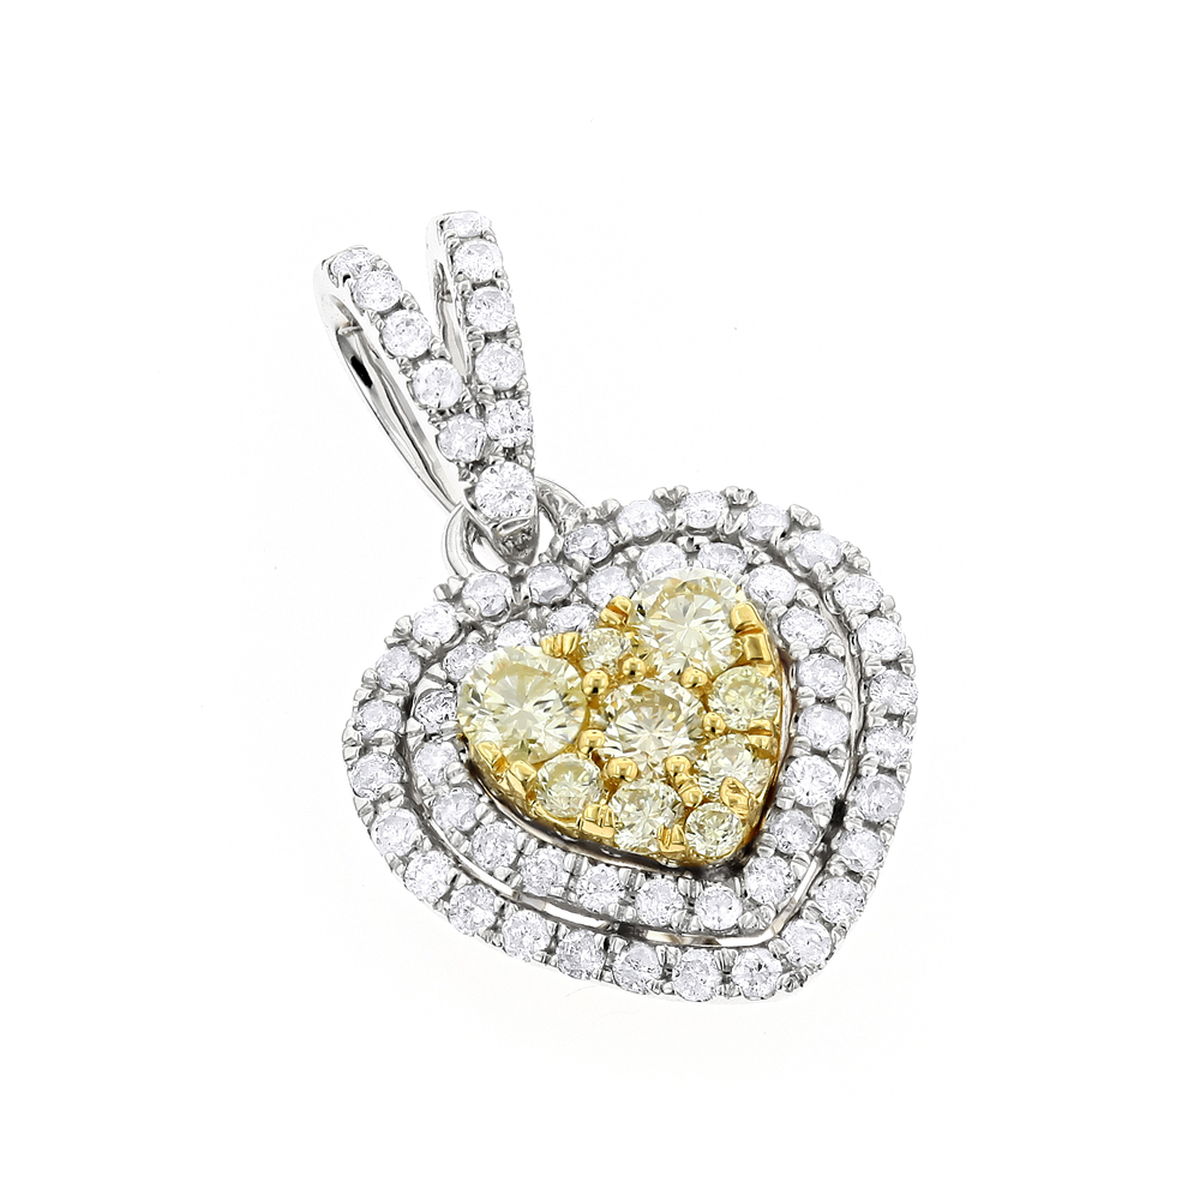 14K Gold White and Yellow Diamonds Heart Pendant for Women 0.88ct